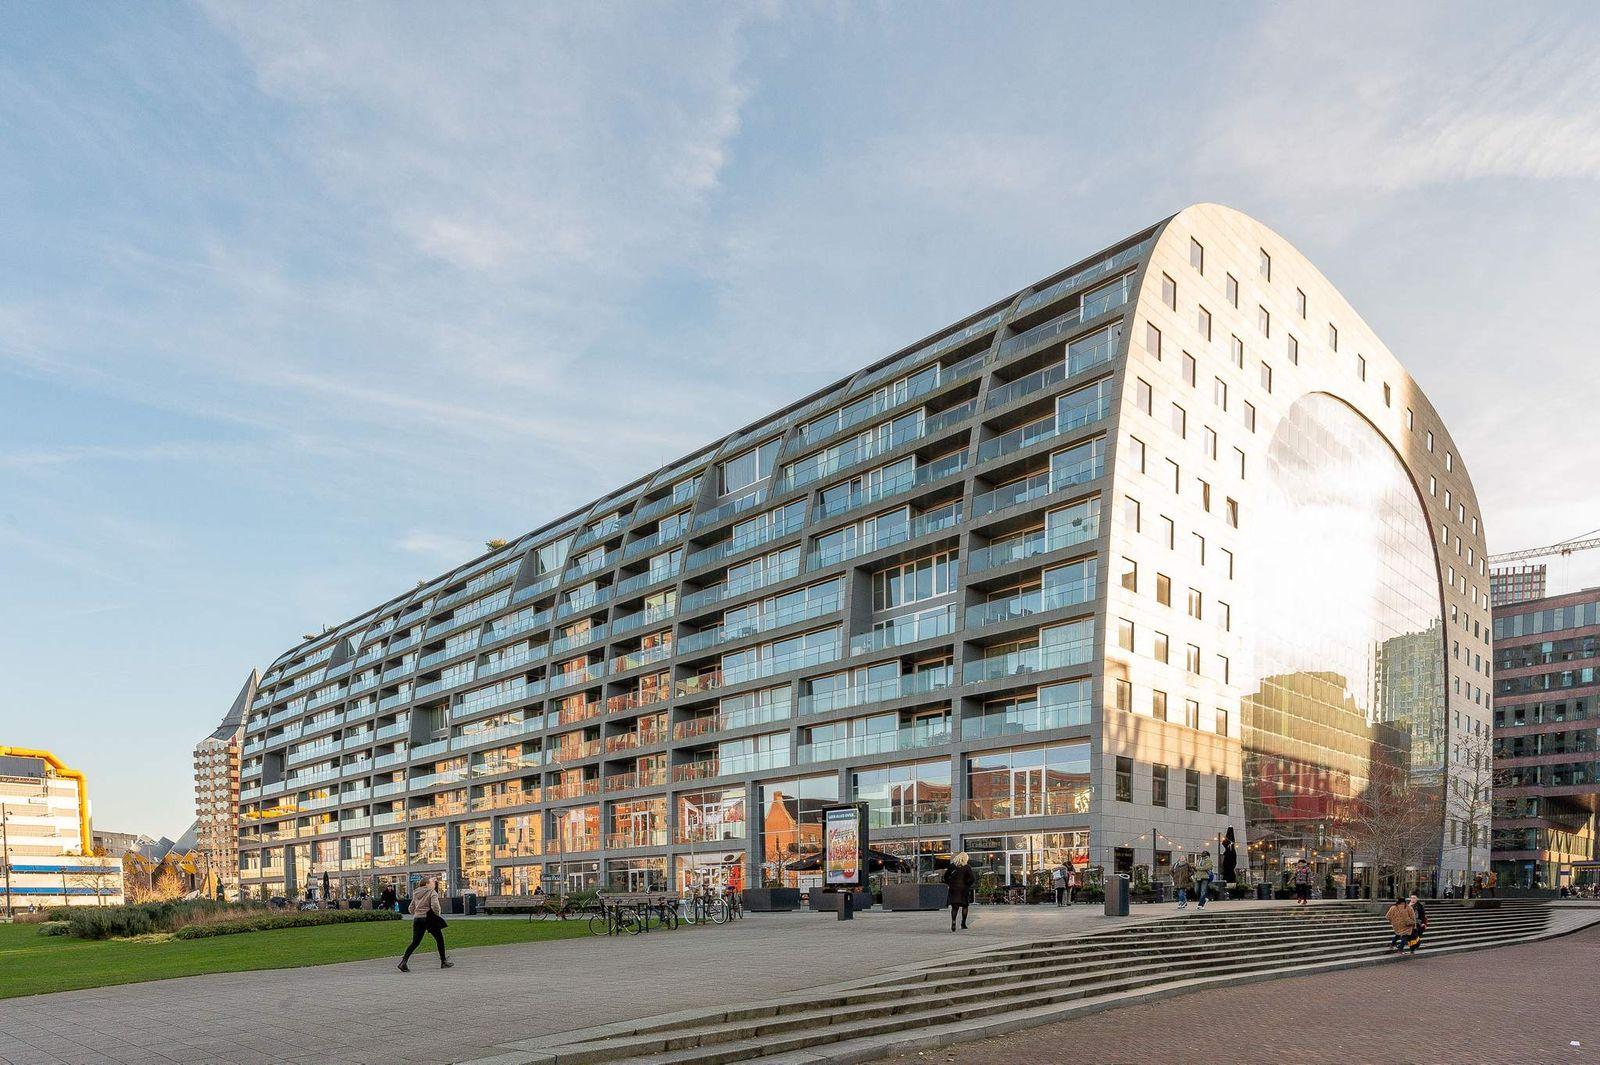 Grotemarkt 152, Rotterdam